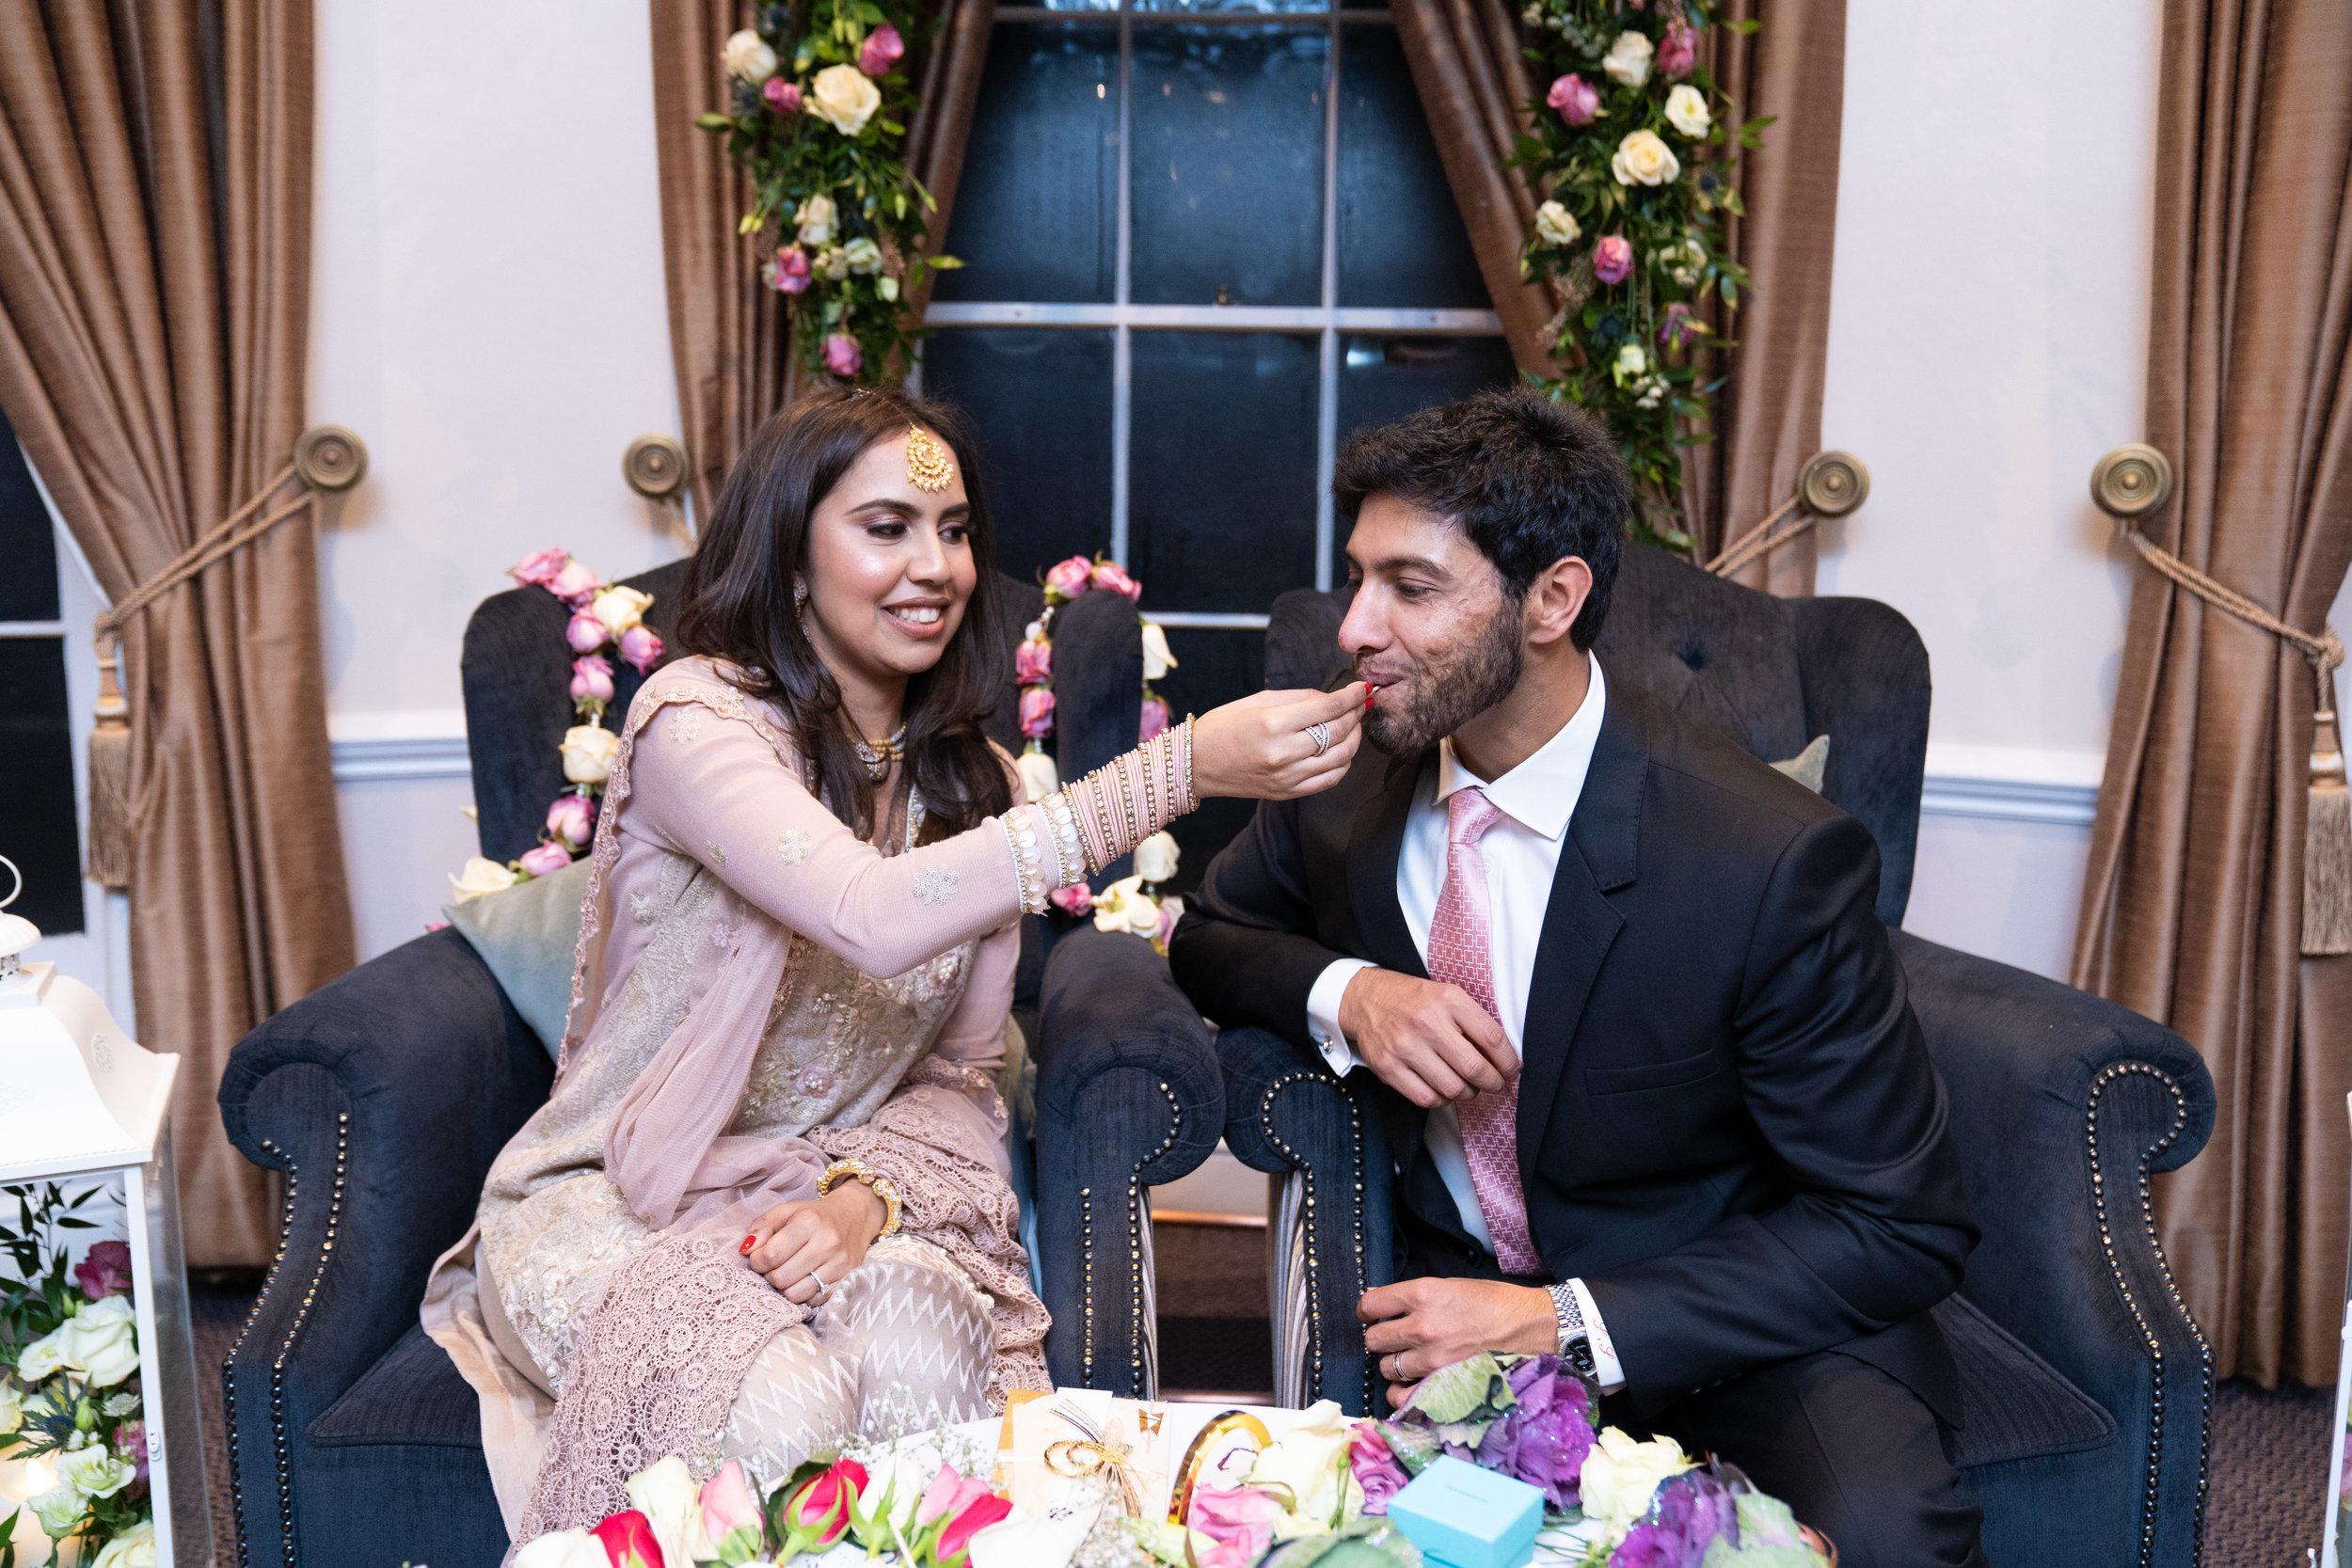 buckinghamshire-golf-club-winter-muslim-wedding-engagement-photography-videography-51